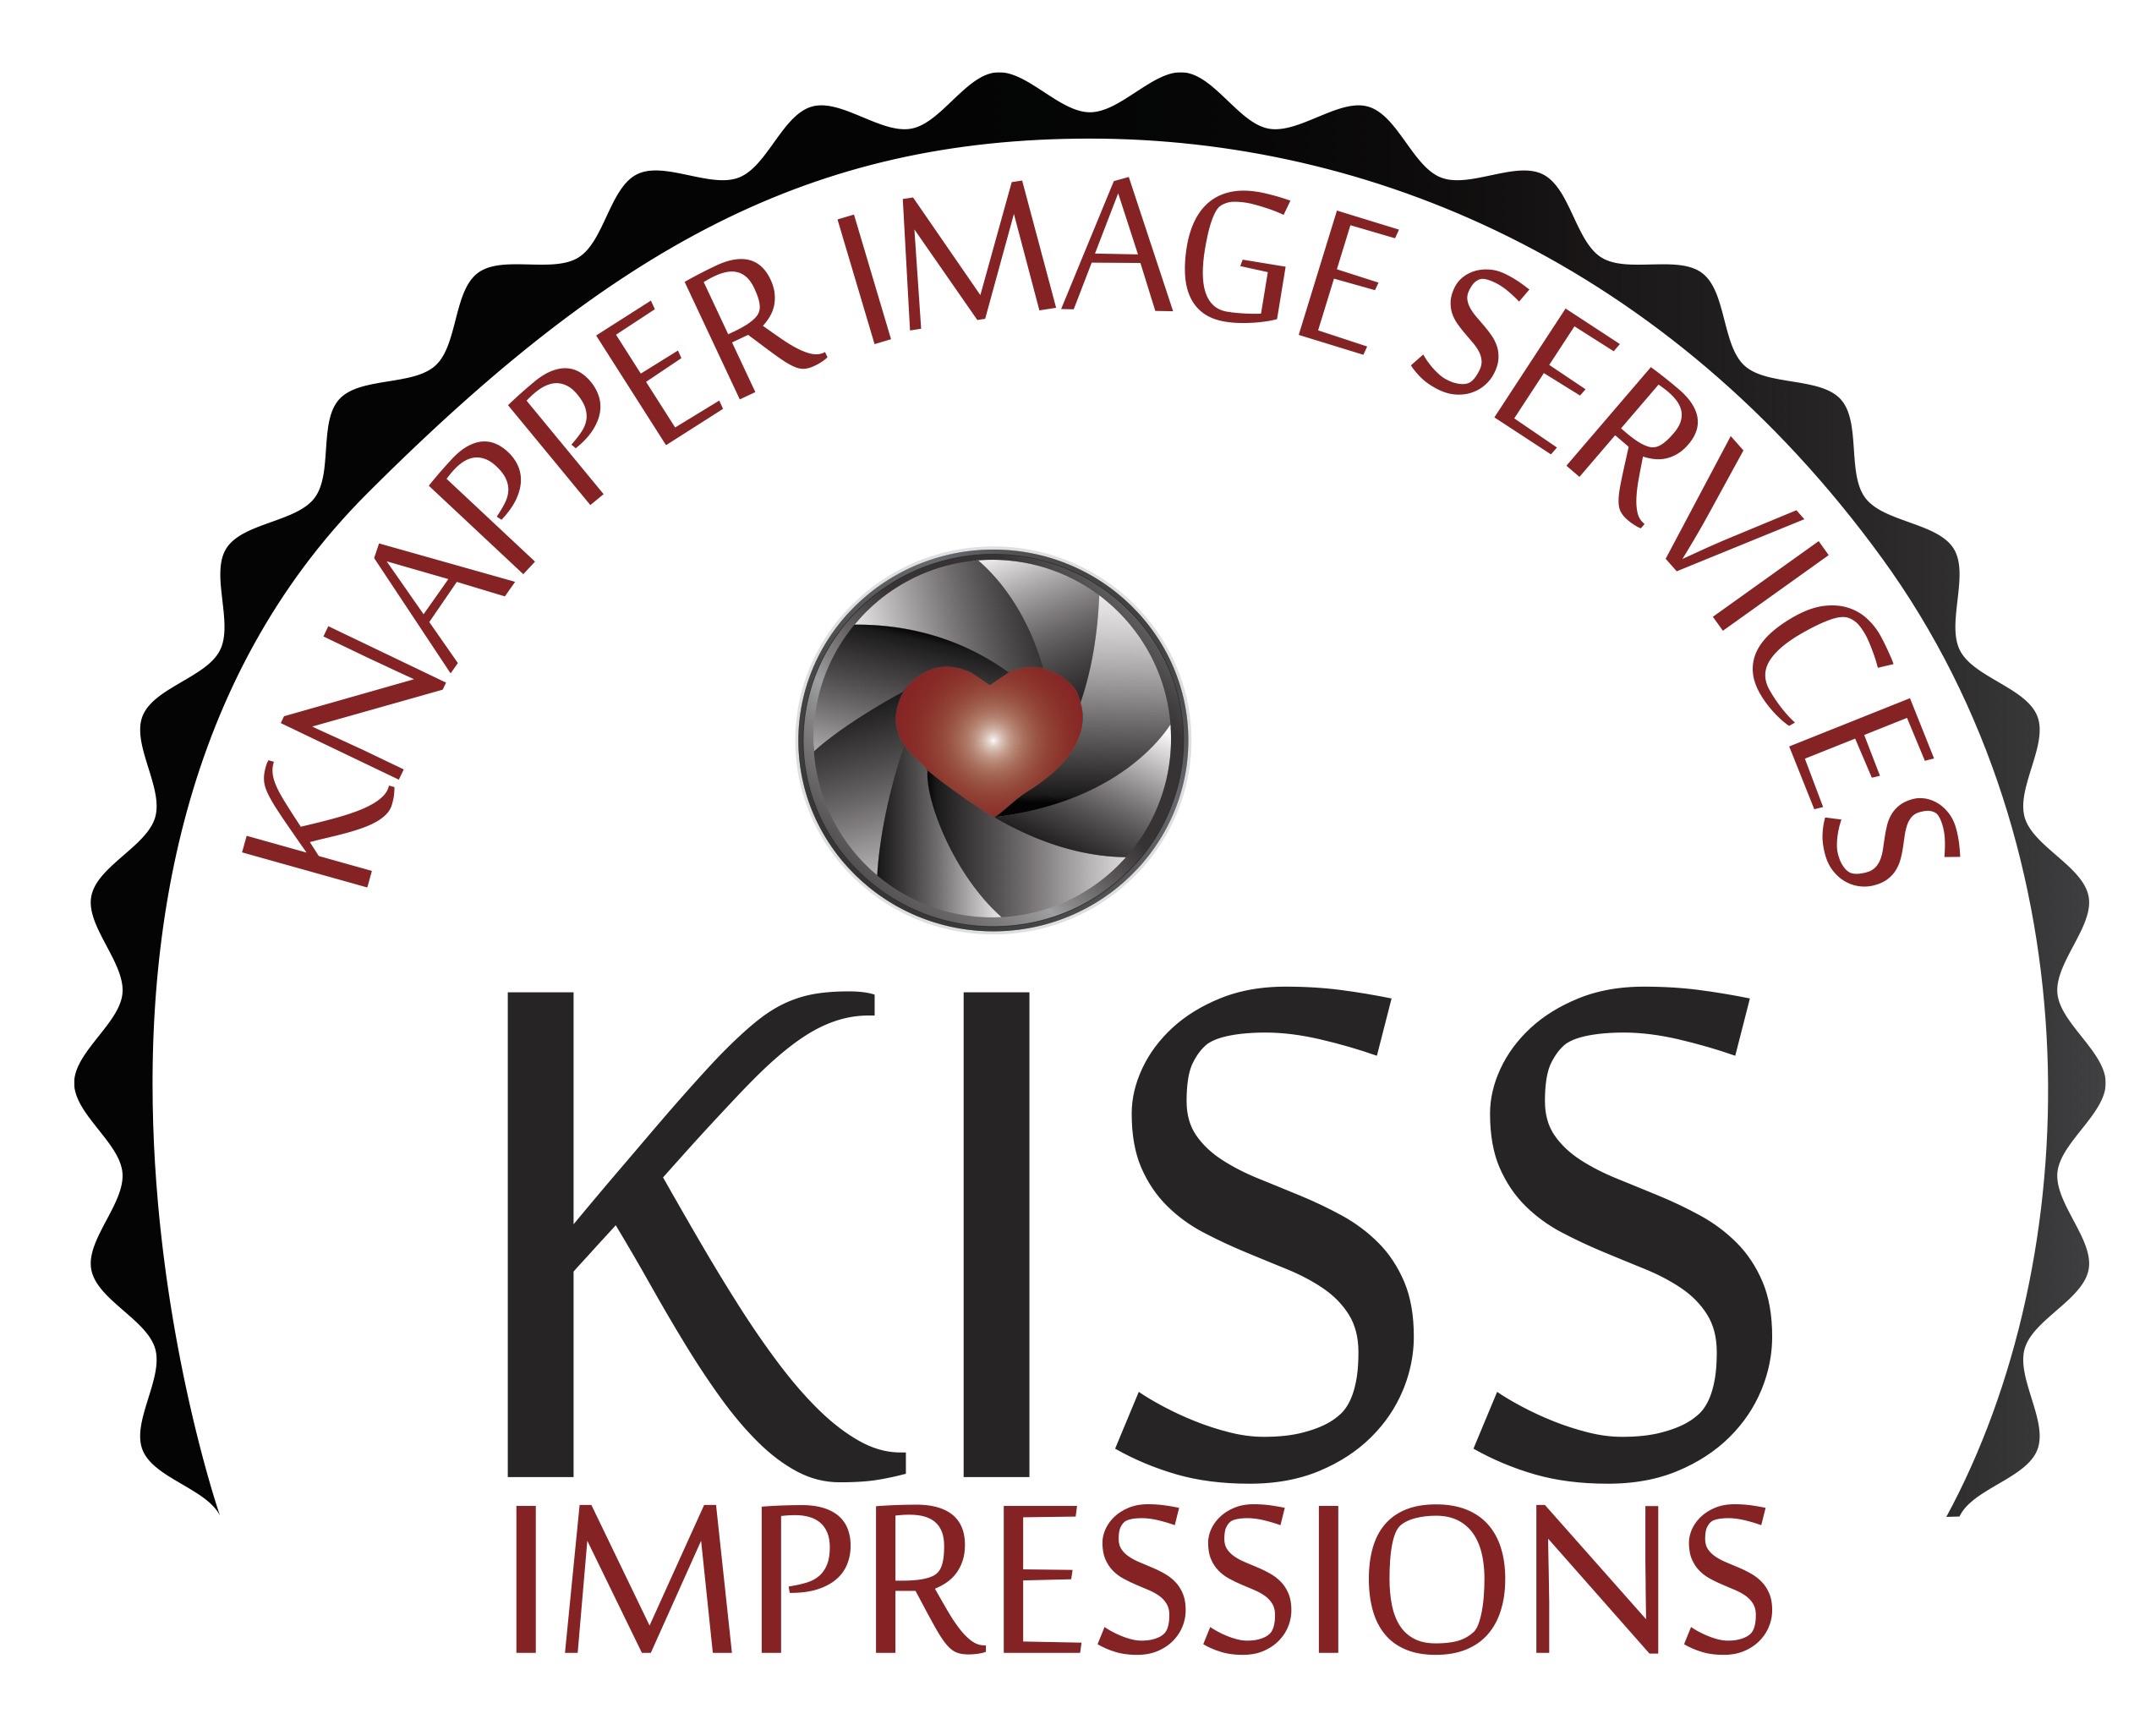 Knapper Image Services